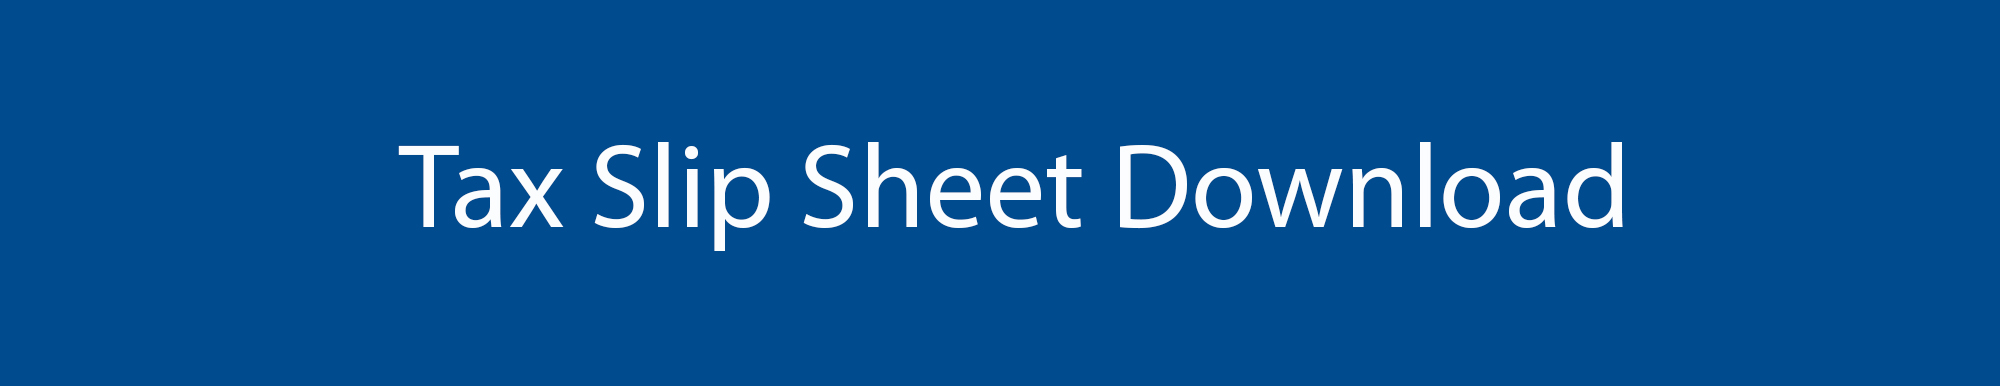 Lang Allan & Company Tax Slip Sheet Download